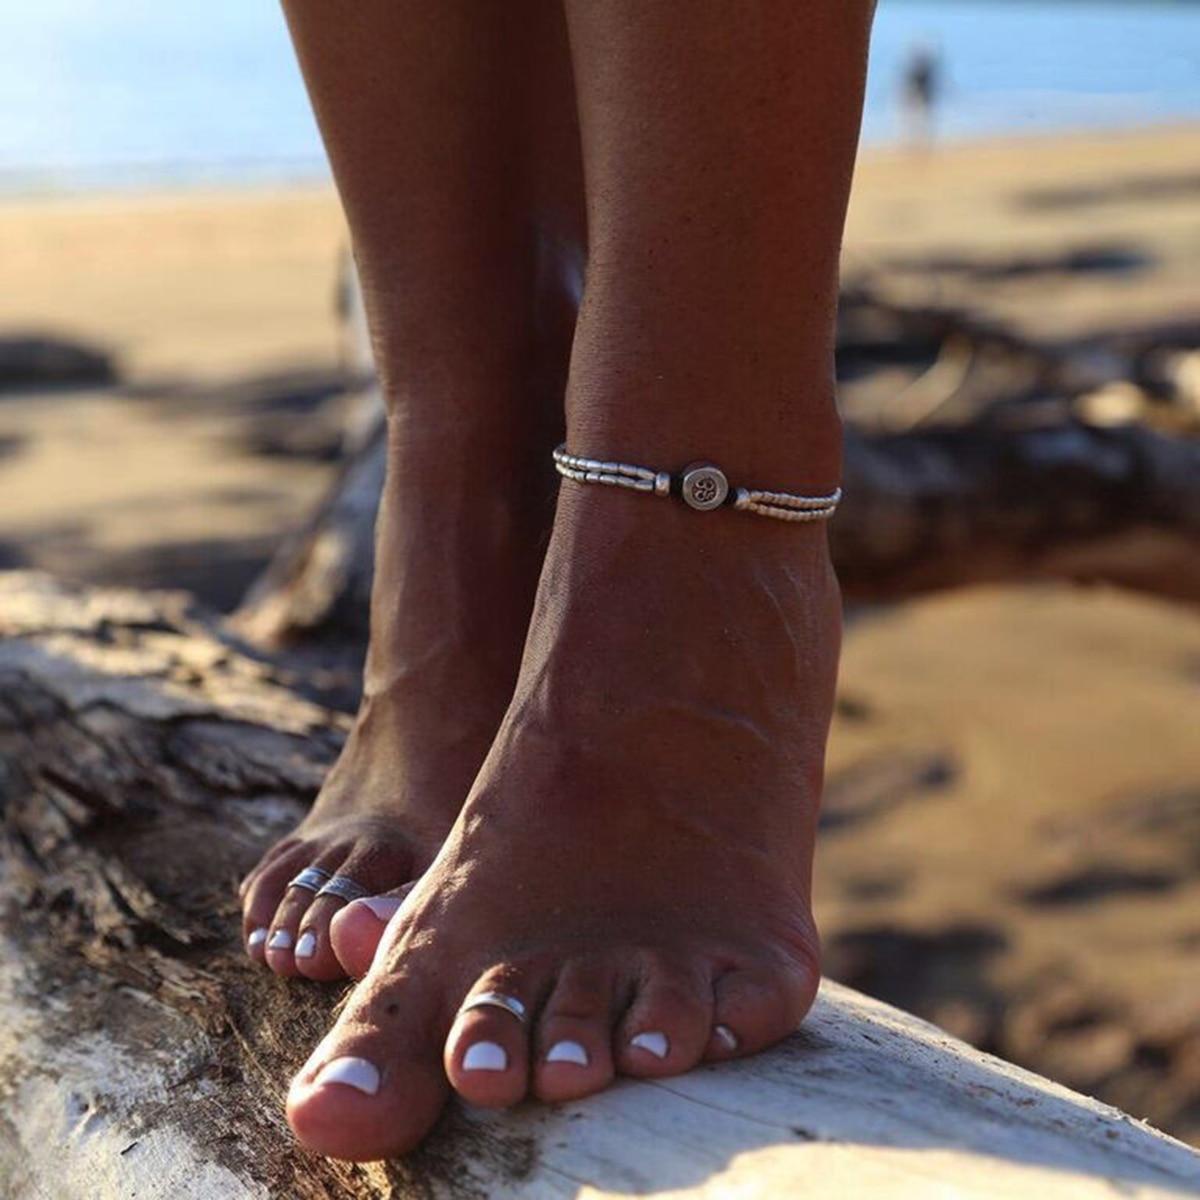 Vintage Bracelet Foot Jewelry Retro Anklet For Women Girls Ankle Leg Chain Charm Starfish Beads Bracelet Fashion Beach Jewelry